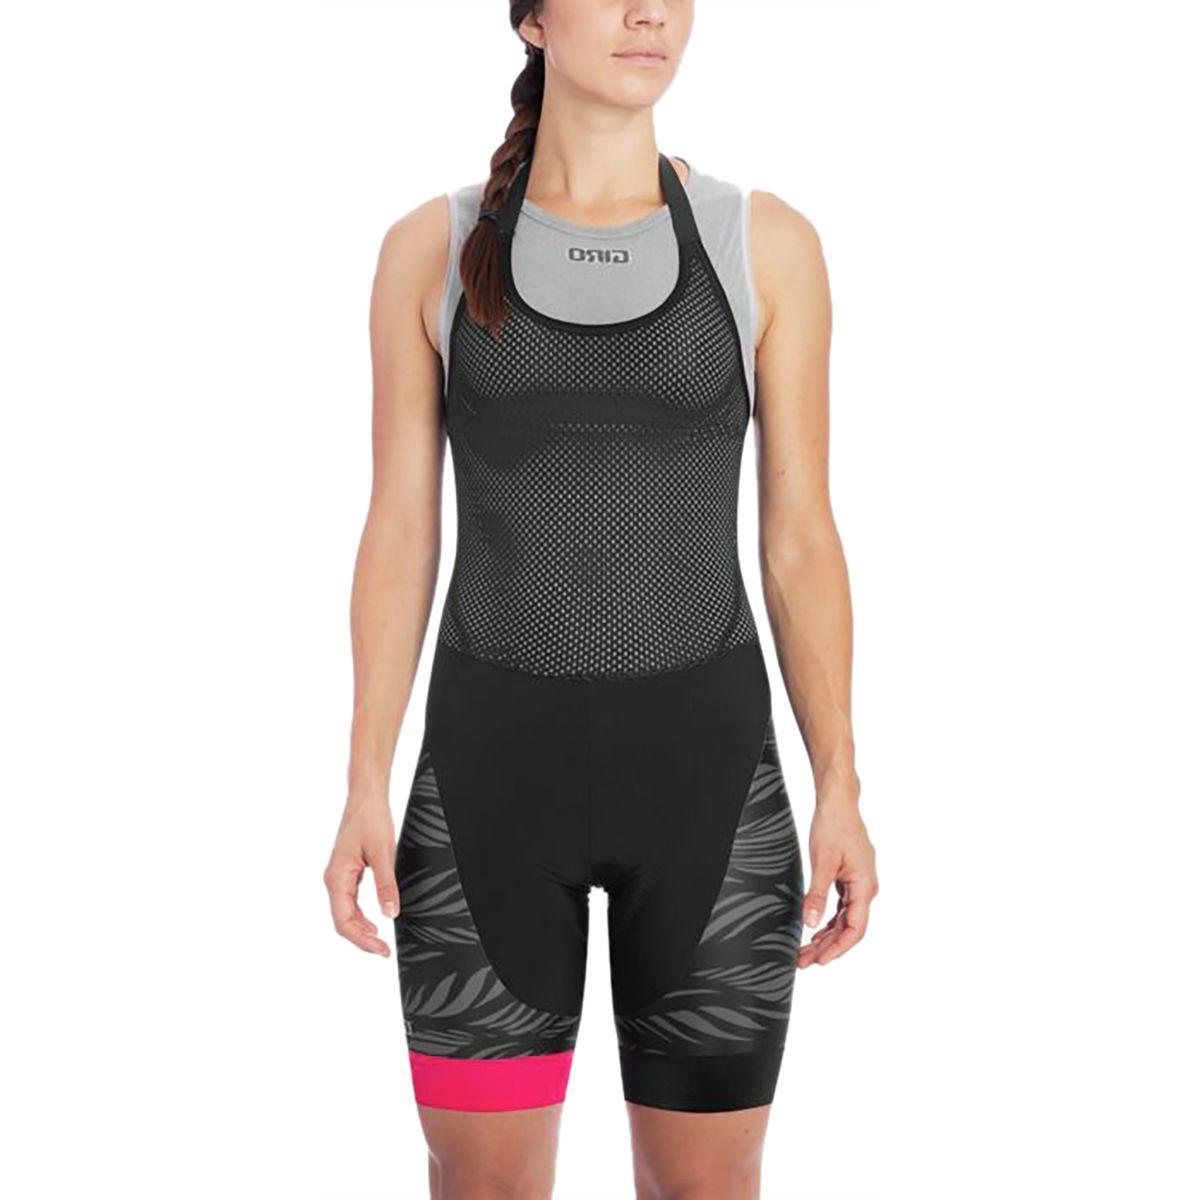 Giro Chrono Expert Halter Bib Short - Women's